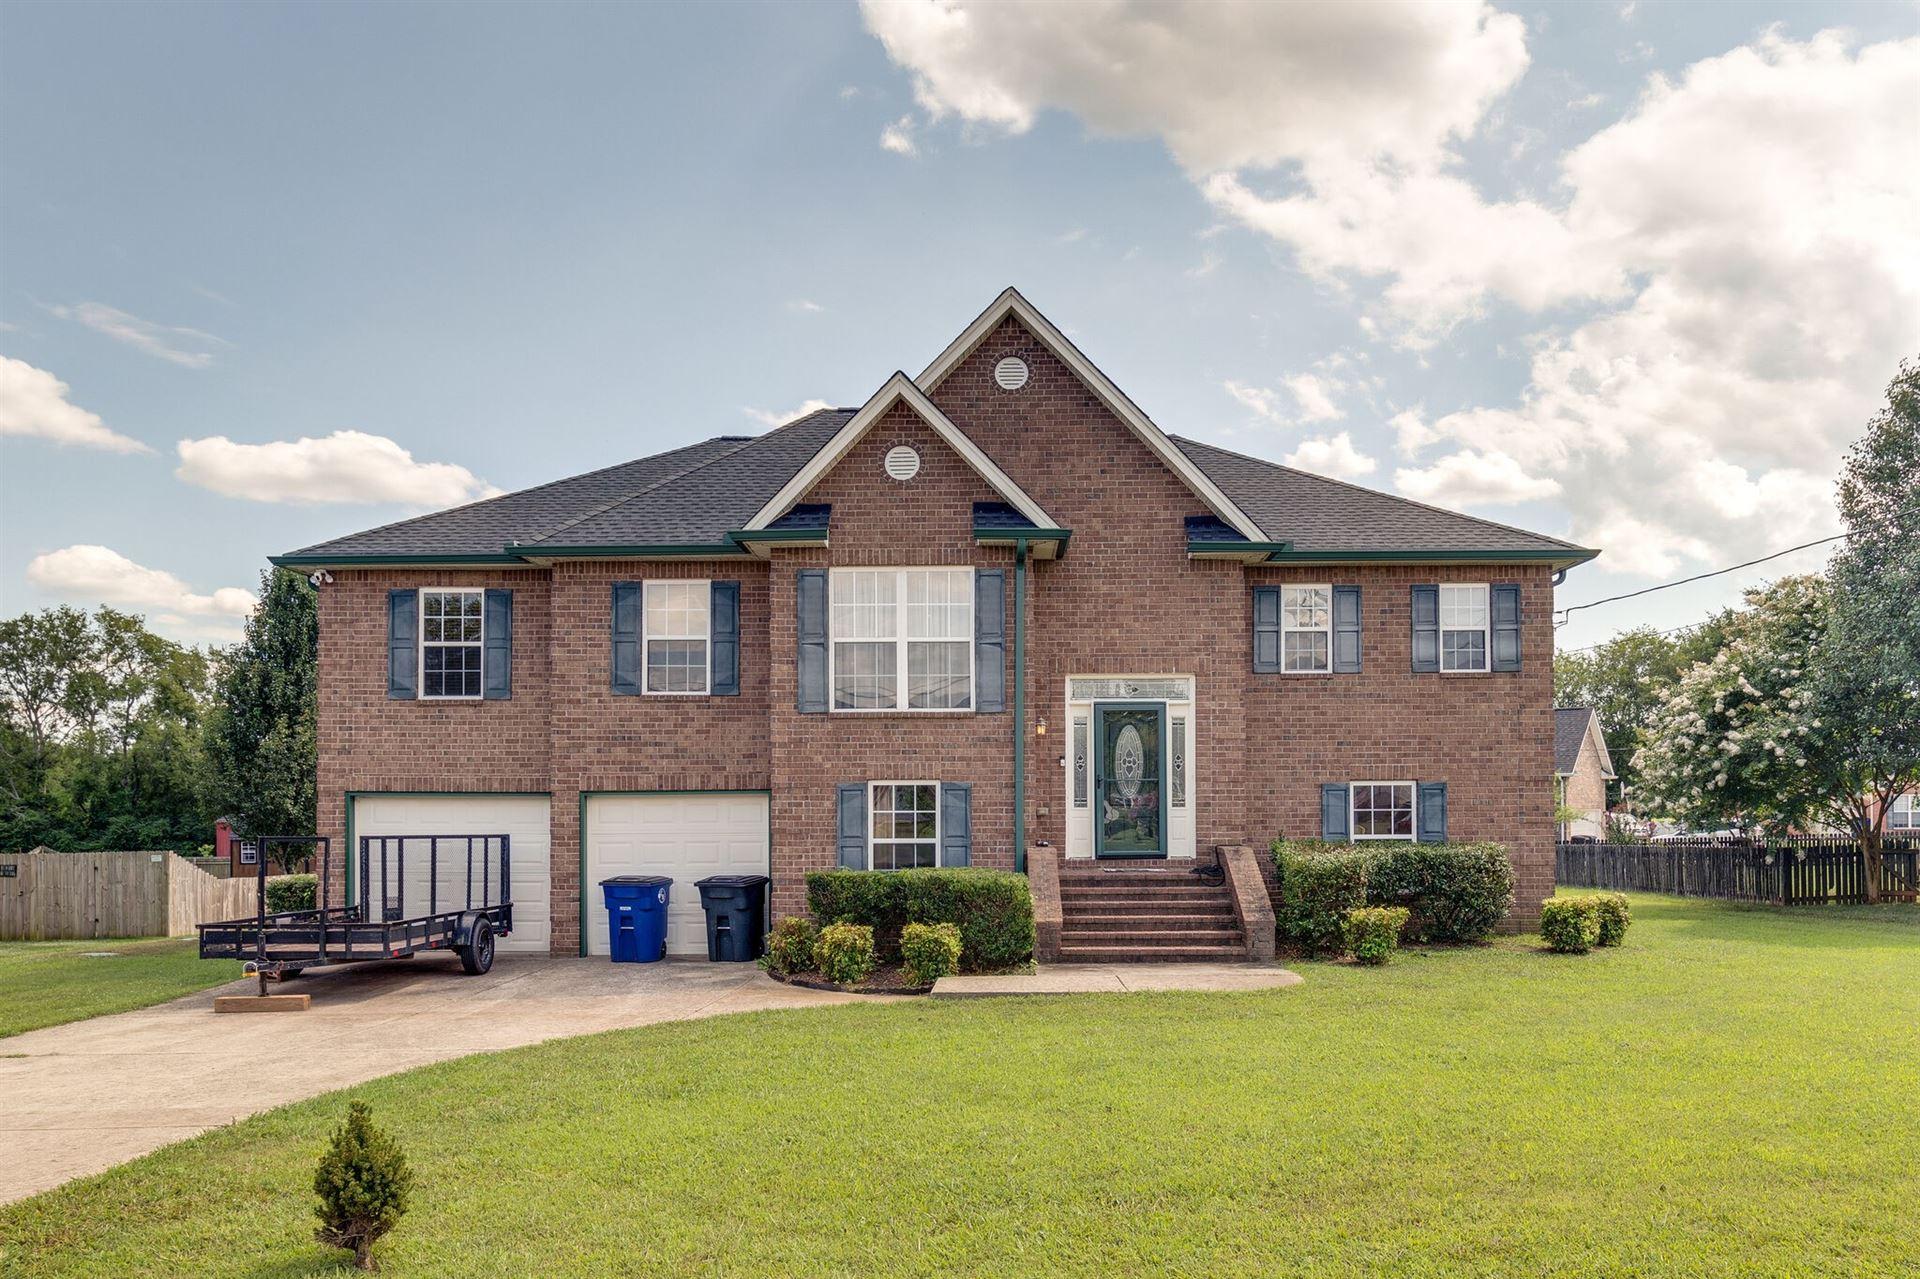 220 Sunnyside Dr, Chapel Hill, TN 37034 - MLS#: 2177097